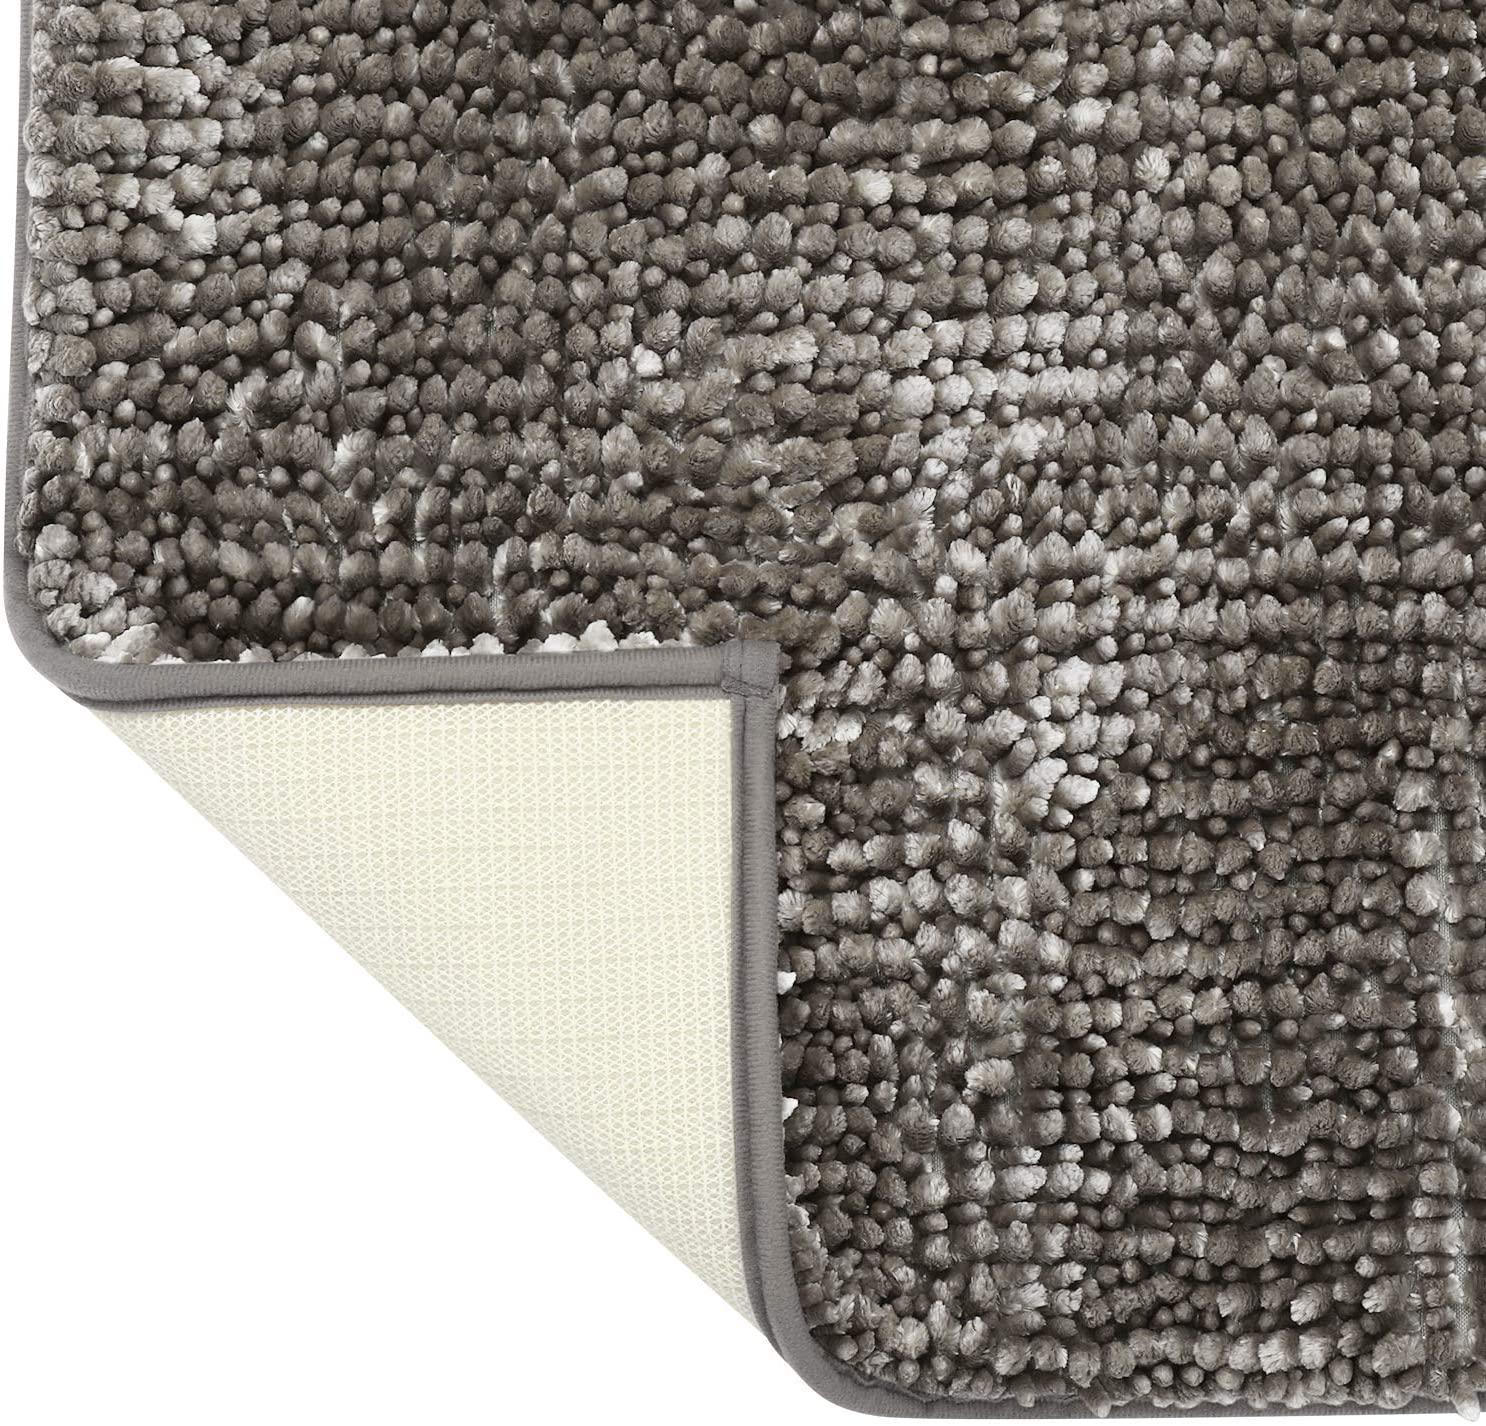 HOMEIDEAS Luxurious U-Shaped Contour Mat - Chenille Taupe Grey Bathroom Rug Mat Butter Absorbent Non Slip - Extra Soft Shag Bath Rug, Bath Mat for Tub, Shower & Bathroom - 20x24 inch